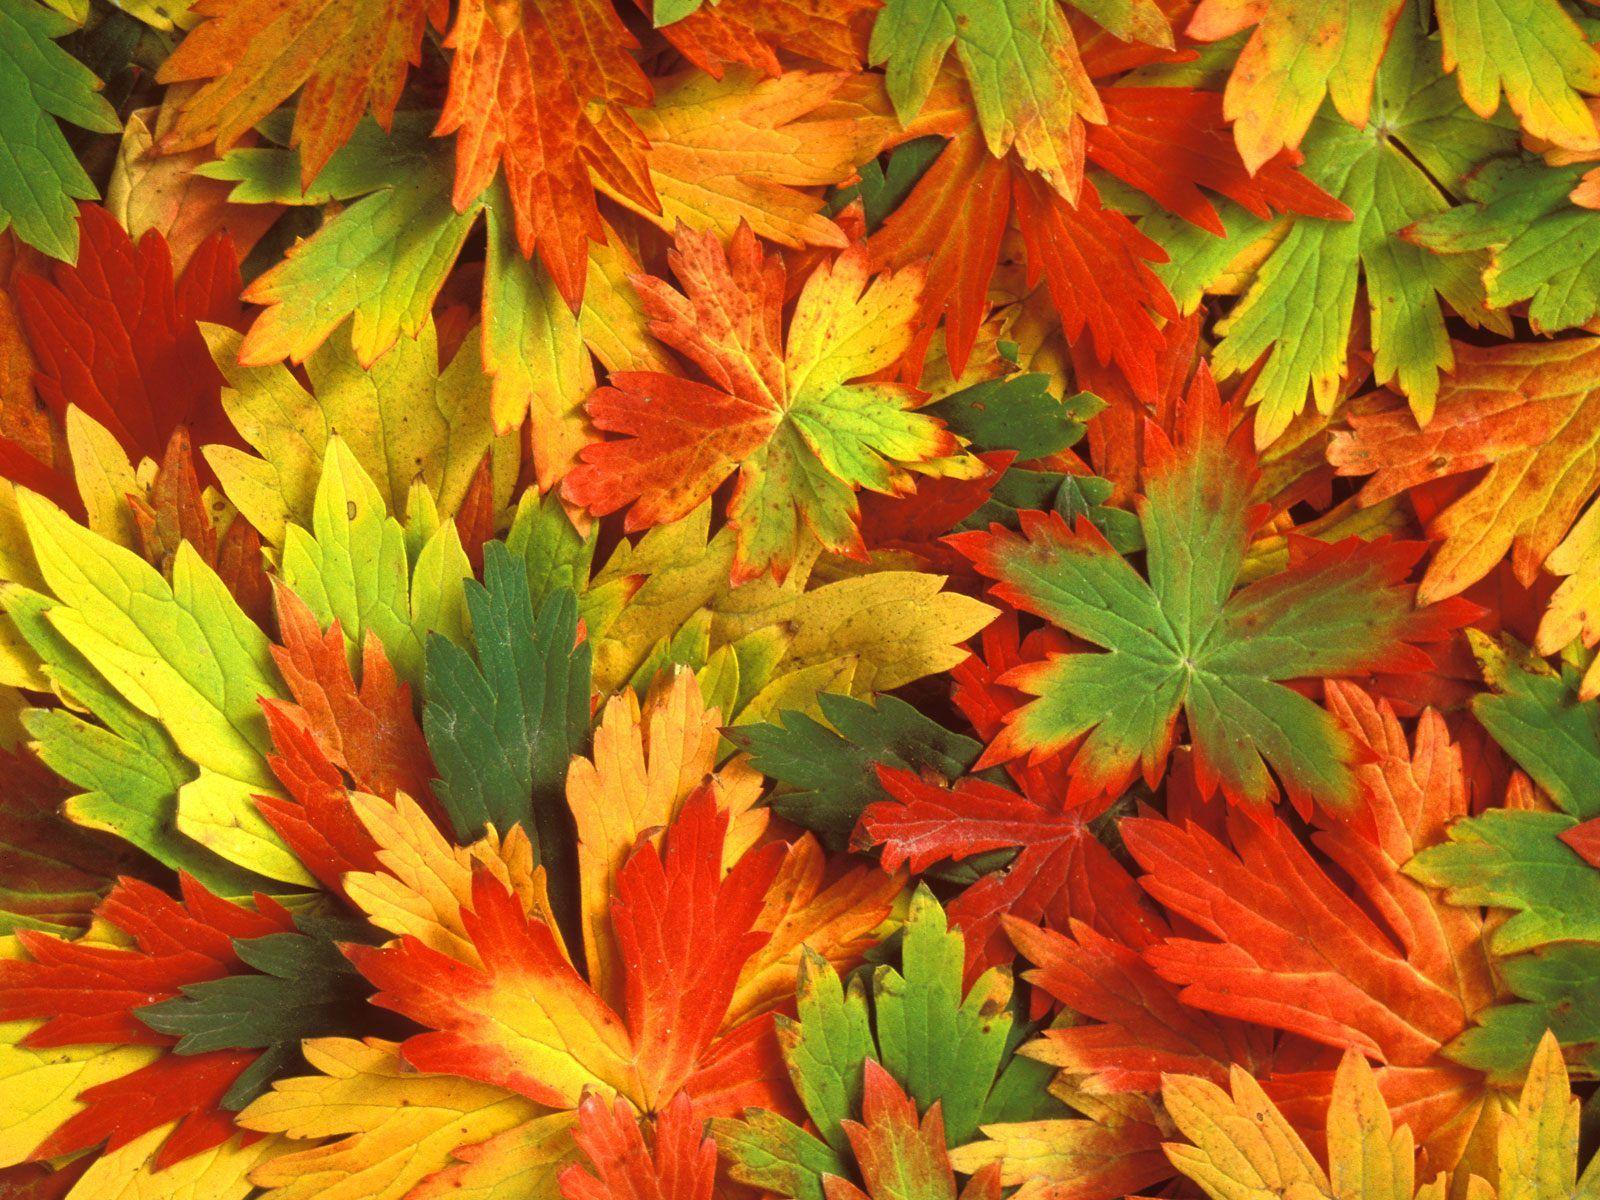 of autumn beautiful leafs autumn leaf scene fresh autumn leafs 1600x1200